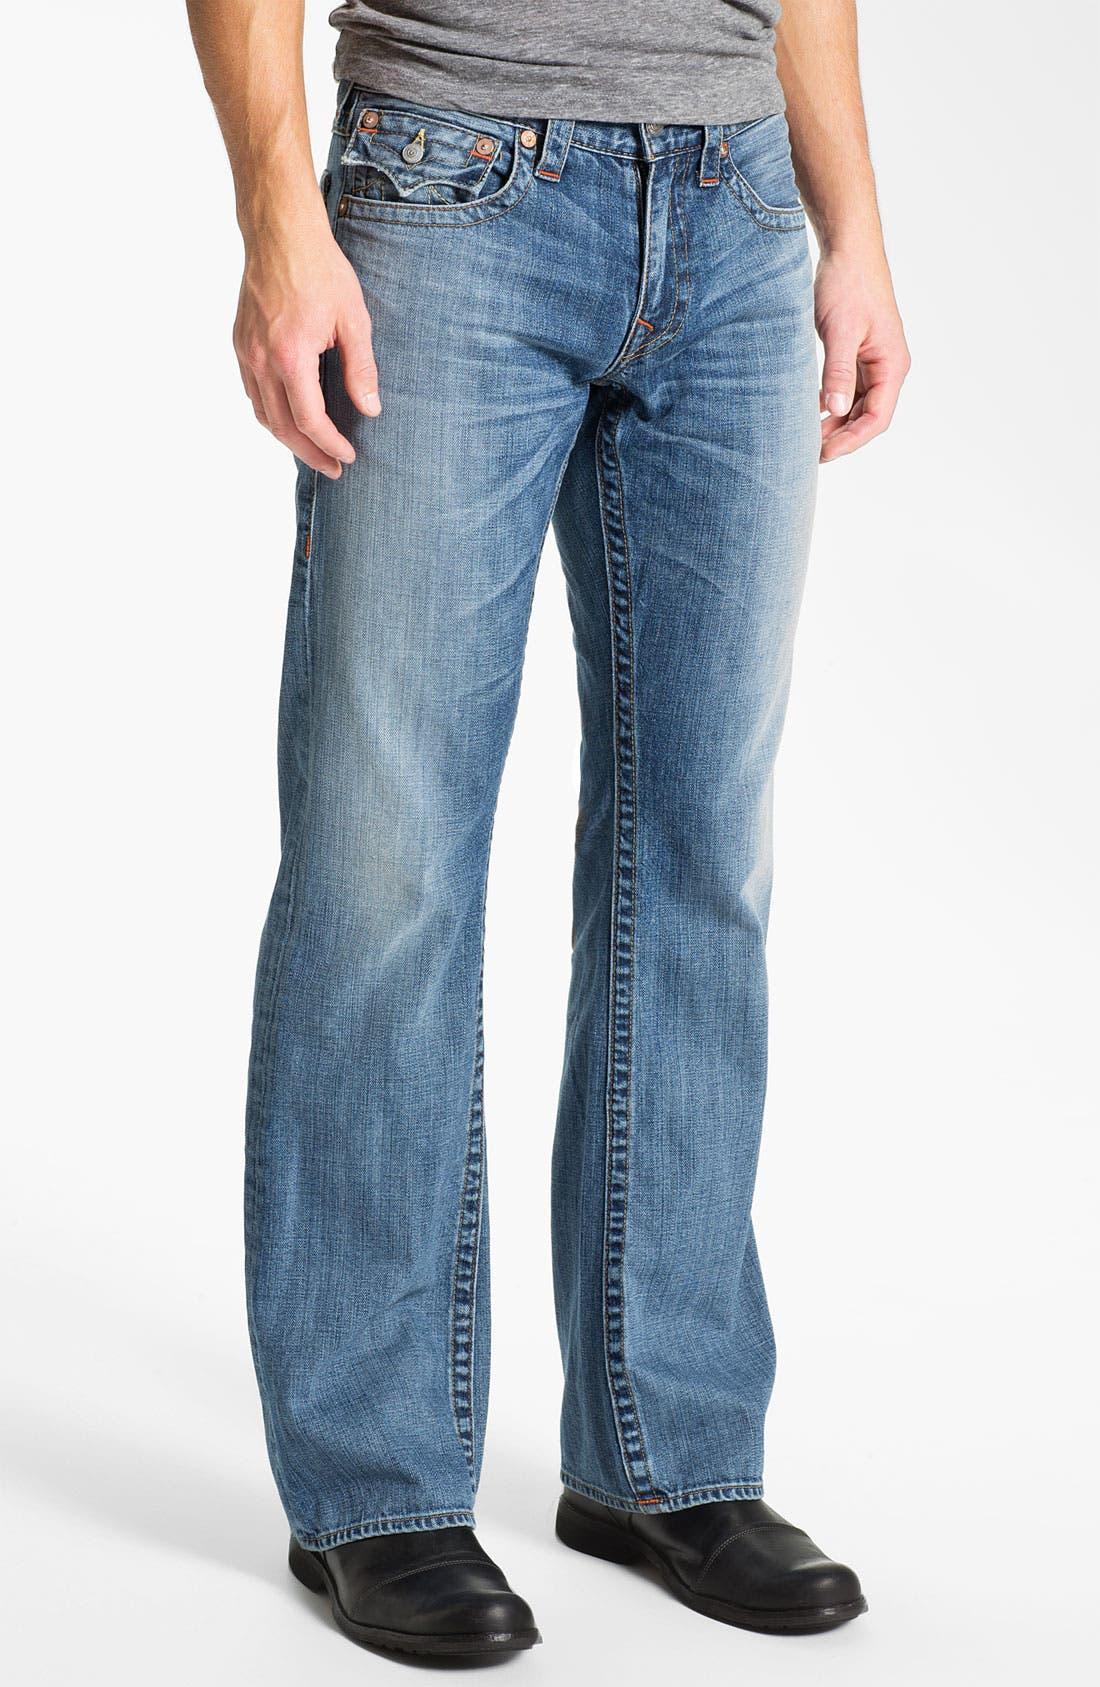 Alternate Image 2  - True Religion Brand Jeans 'Billy' Bootcut Jeans (Vam Shade Horizon)